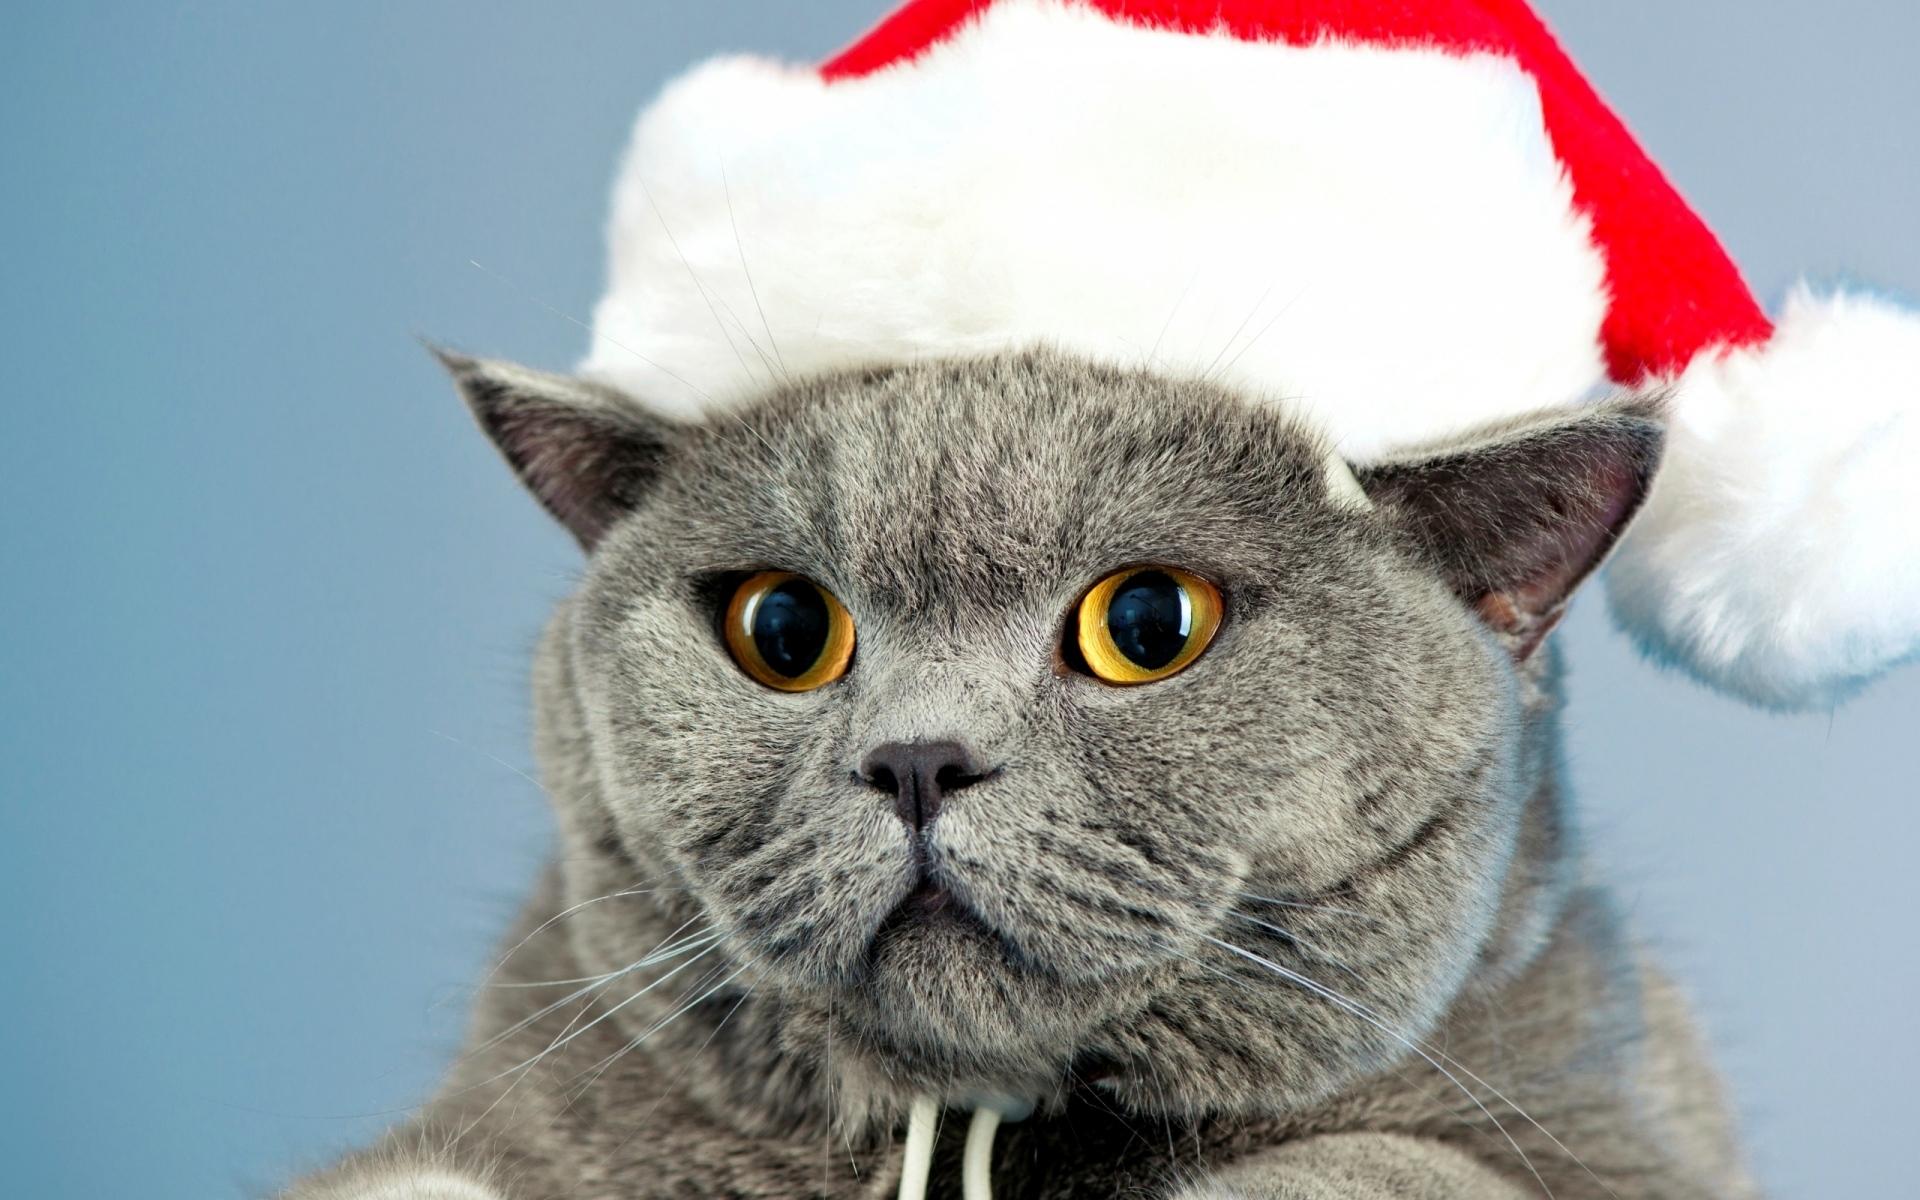 Animal Cat Christmas Pet Santa Hat Yellow Eyes 1920x1200